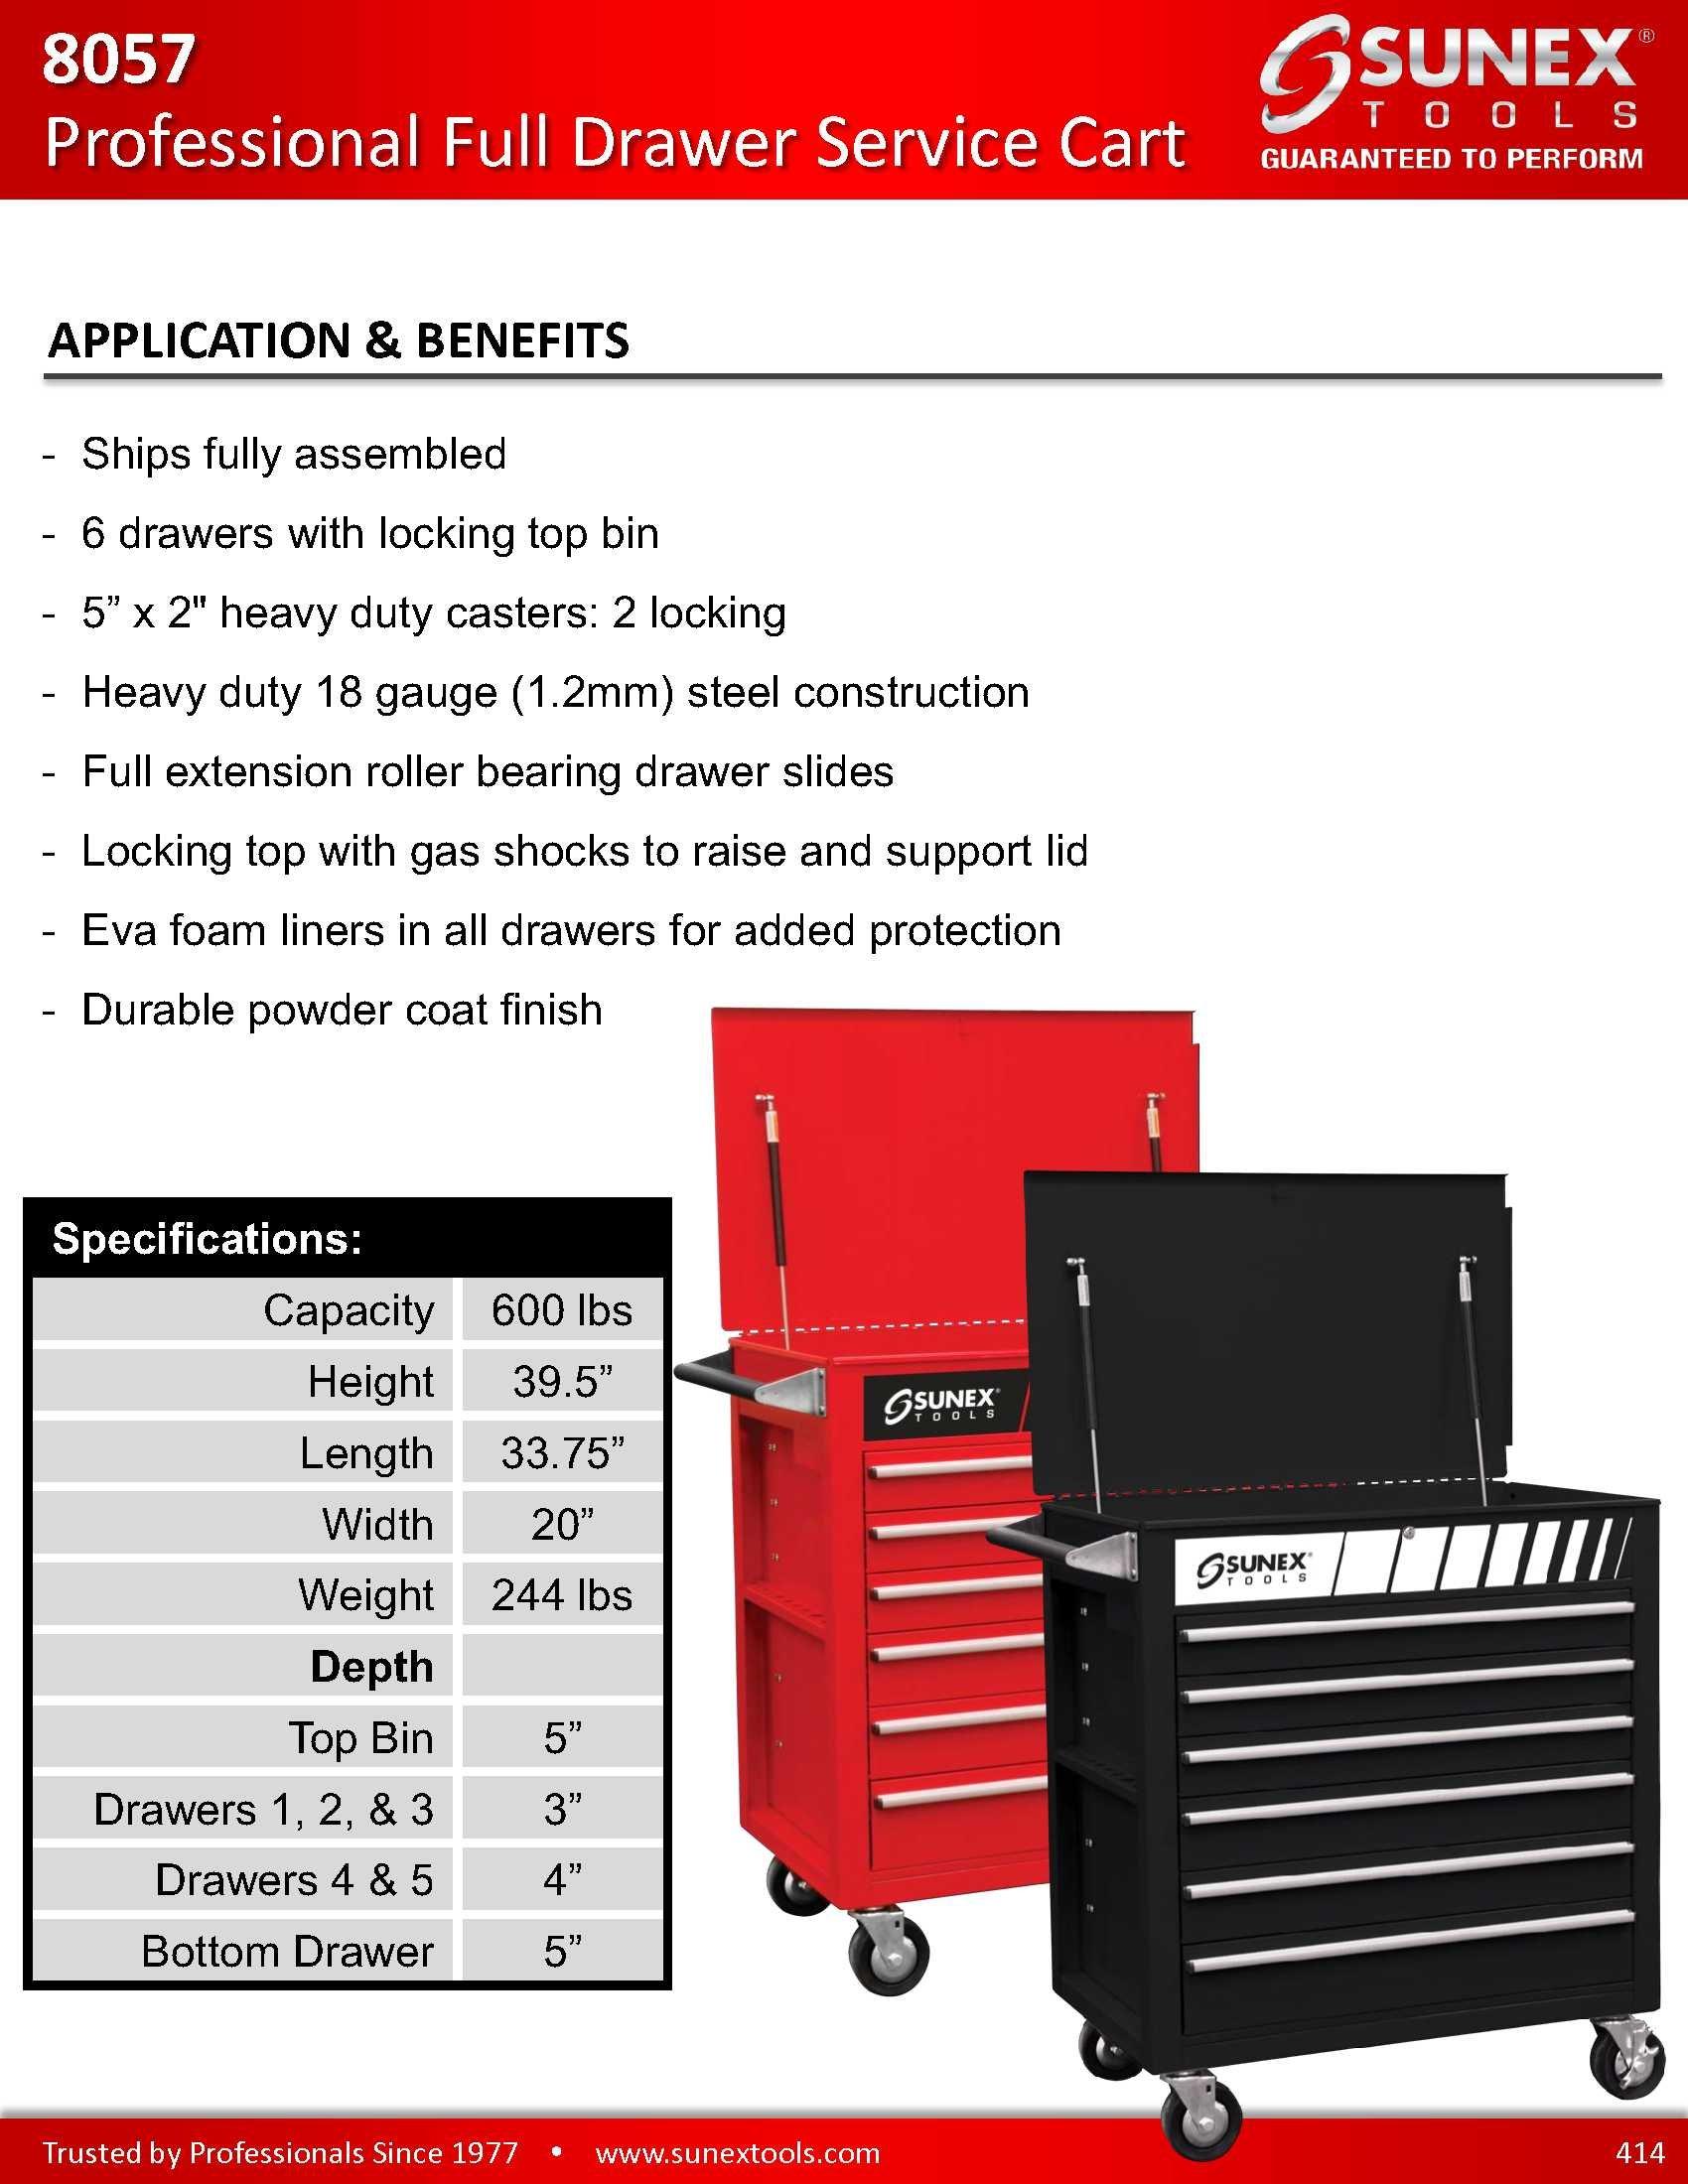 Sunex 8057 Premium Full Drawer Service Red Cart by Sunex Tools (Image #2)